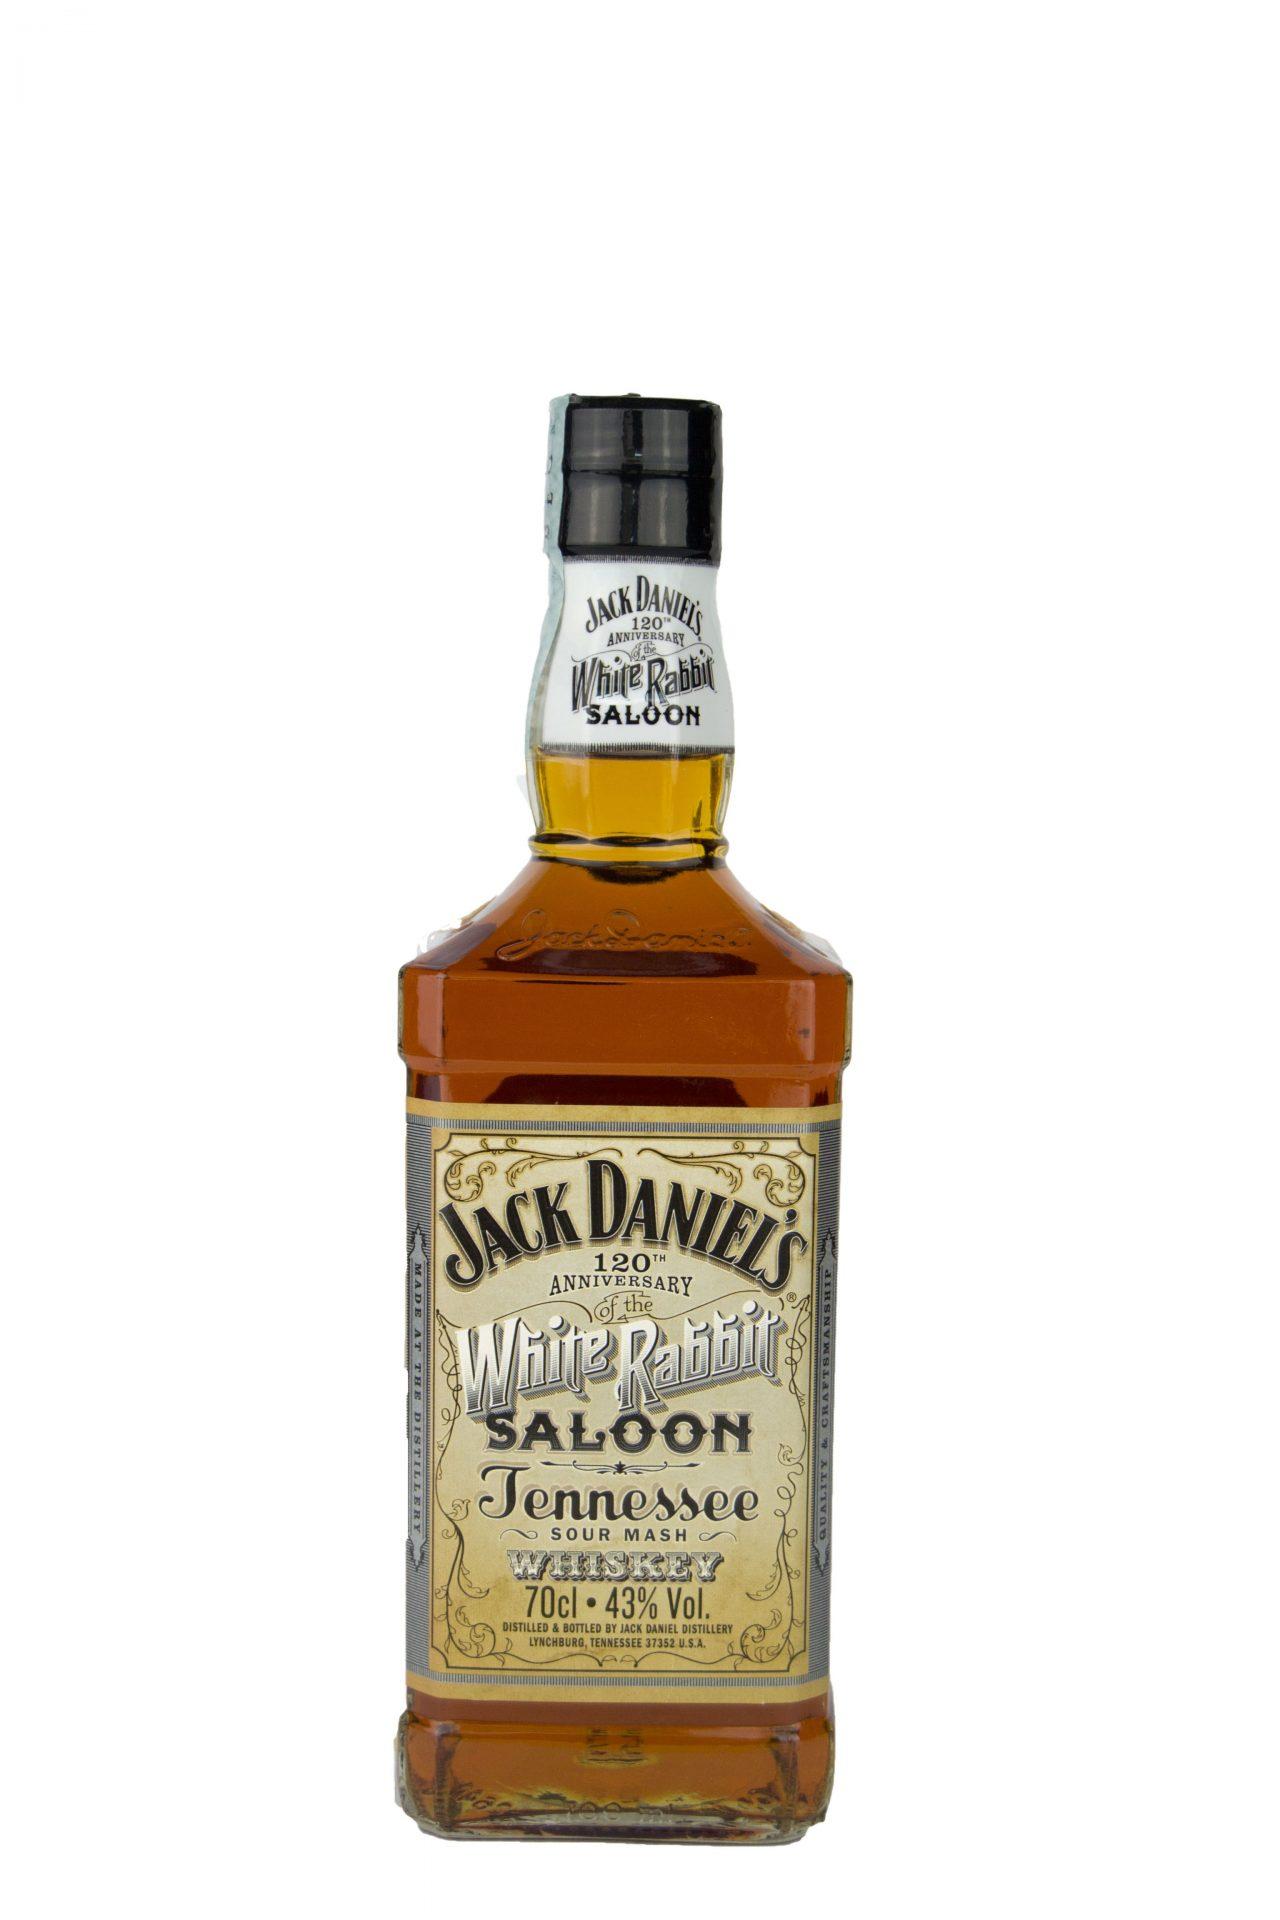 Jack Daniel's – White Rabbit Saloon